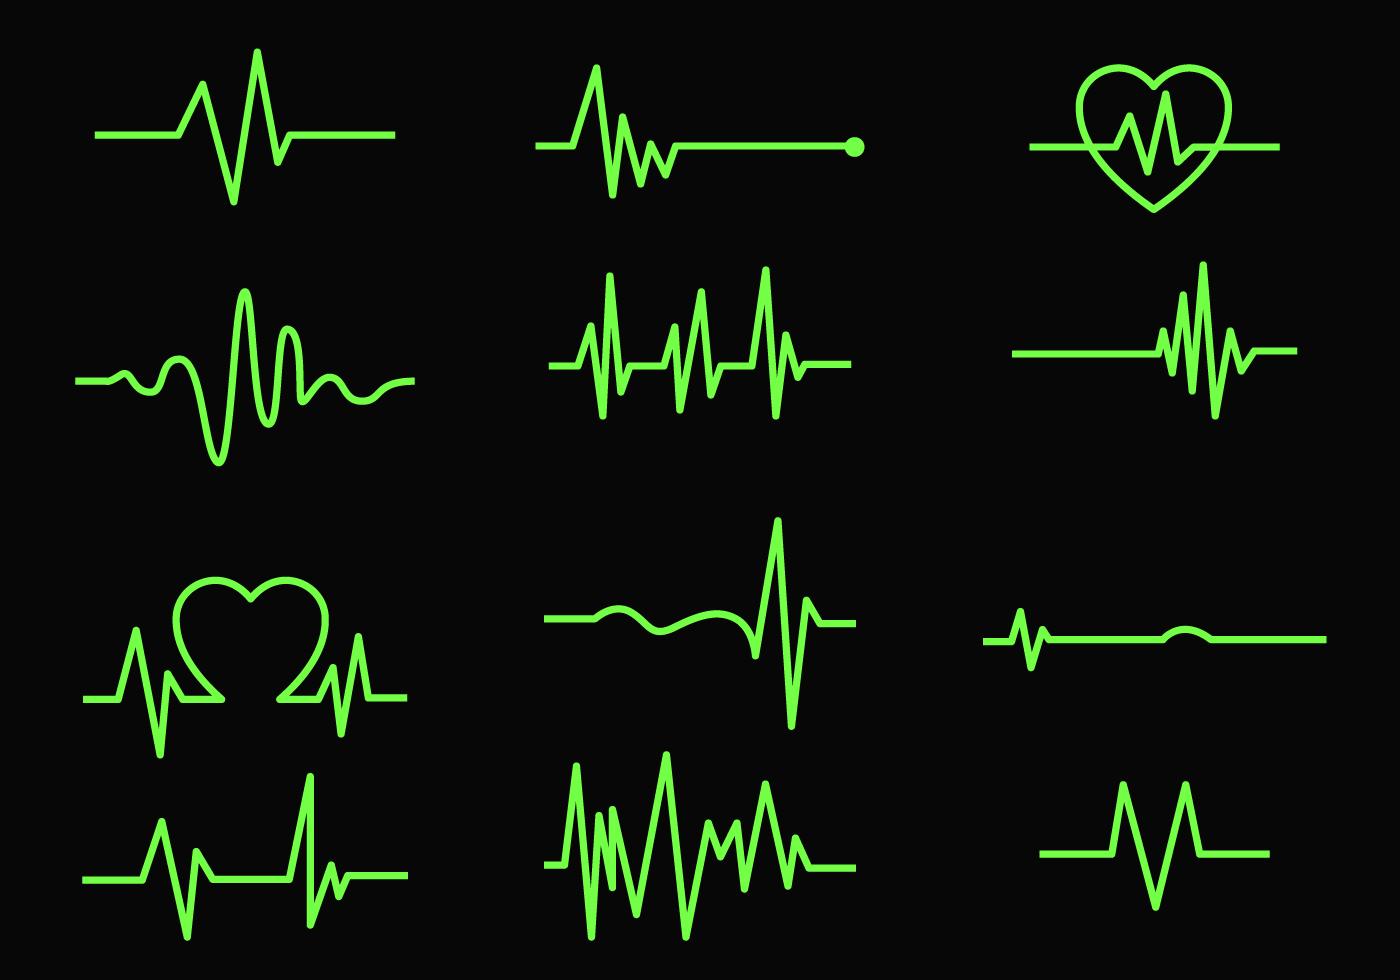 Ekg Free Vector Art 4763 Downloads Heartbeatmonitorcircuitjpg